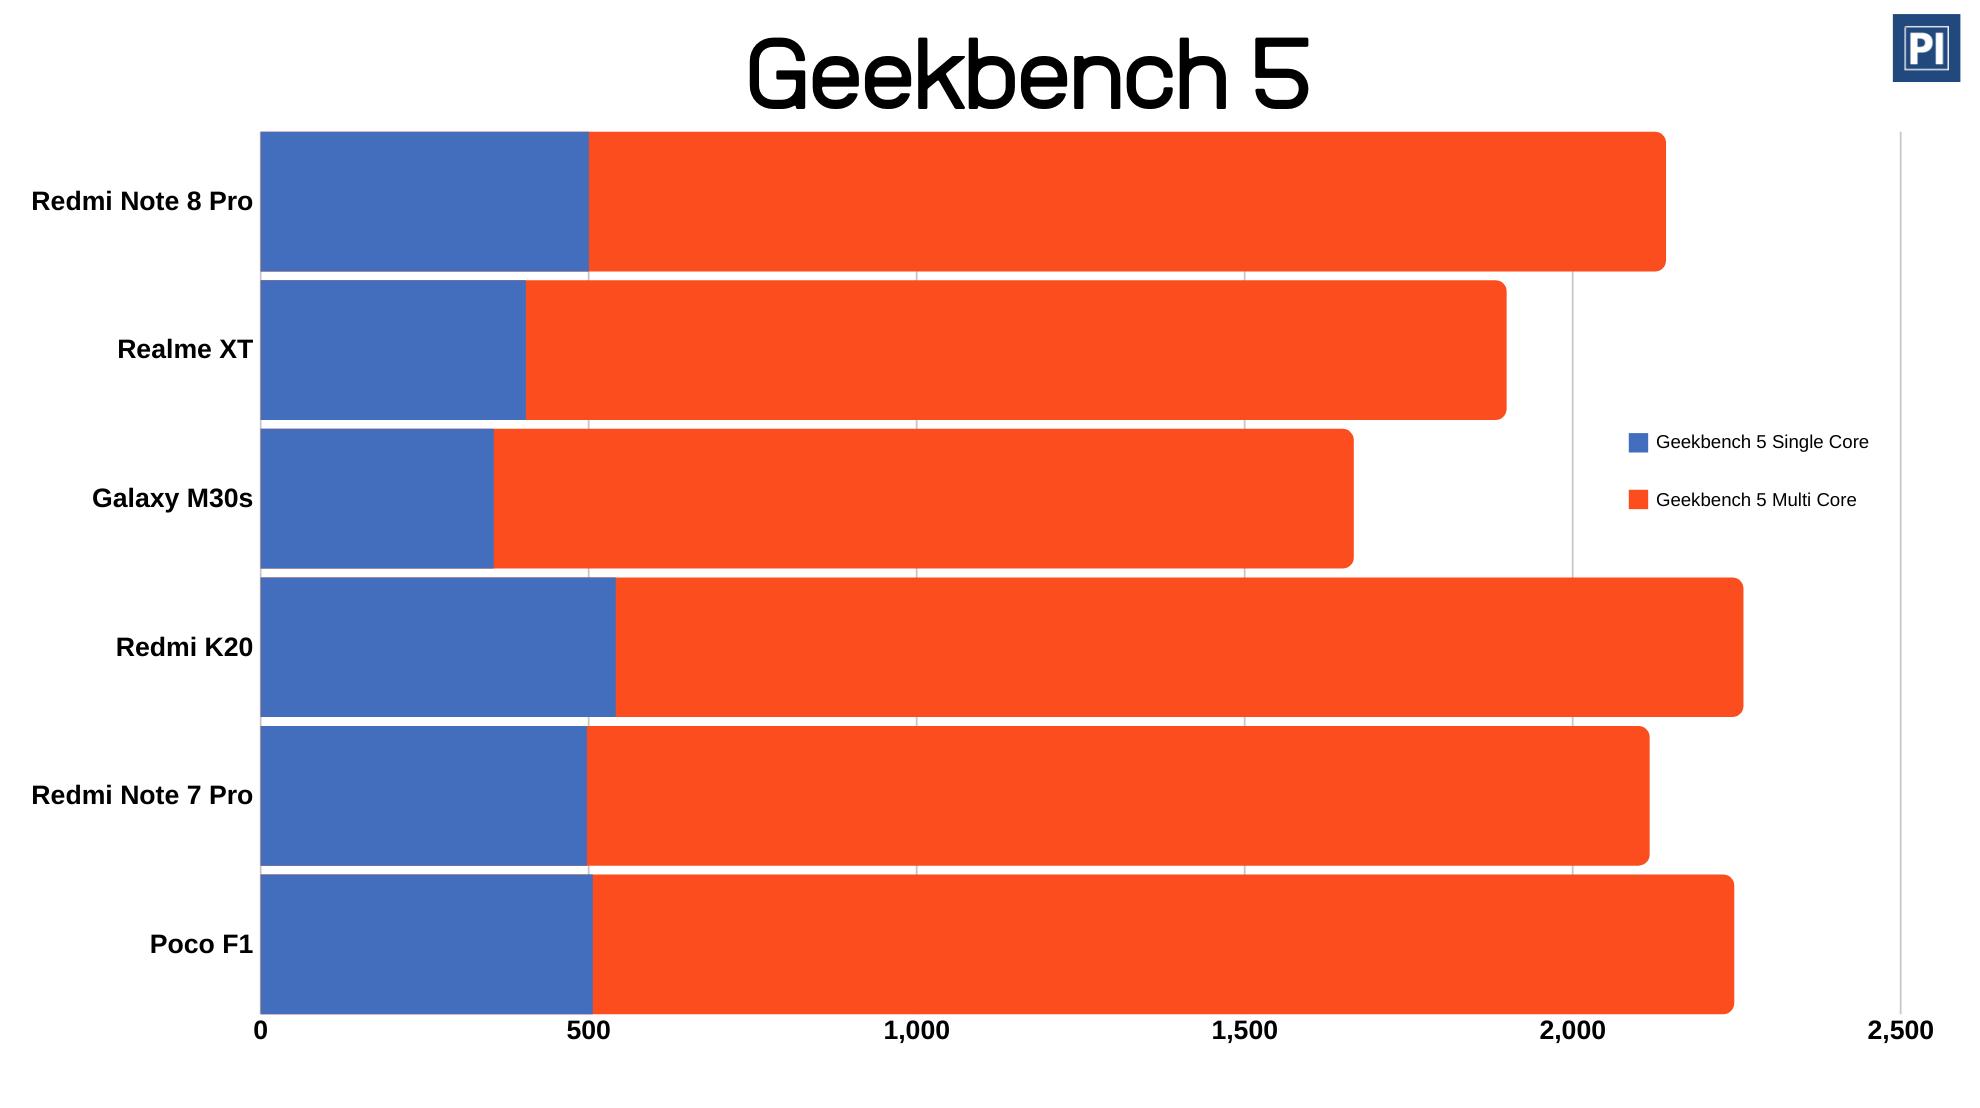 Redmi Note 8 Pro GeekBench 5 Benchmark against Realme XT